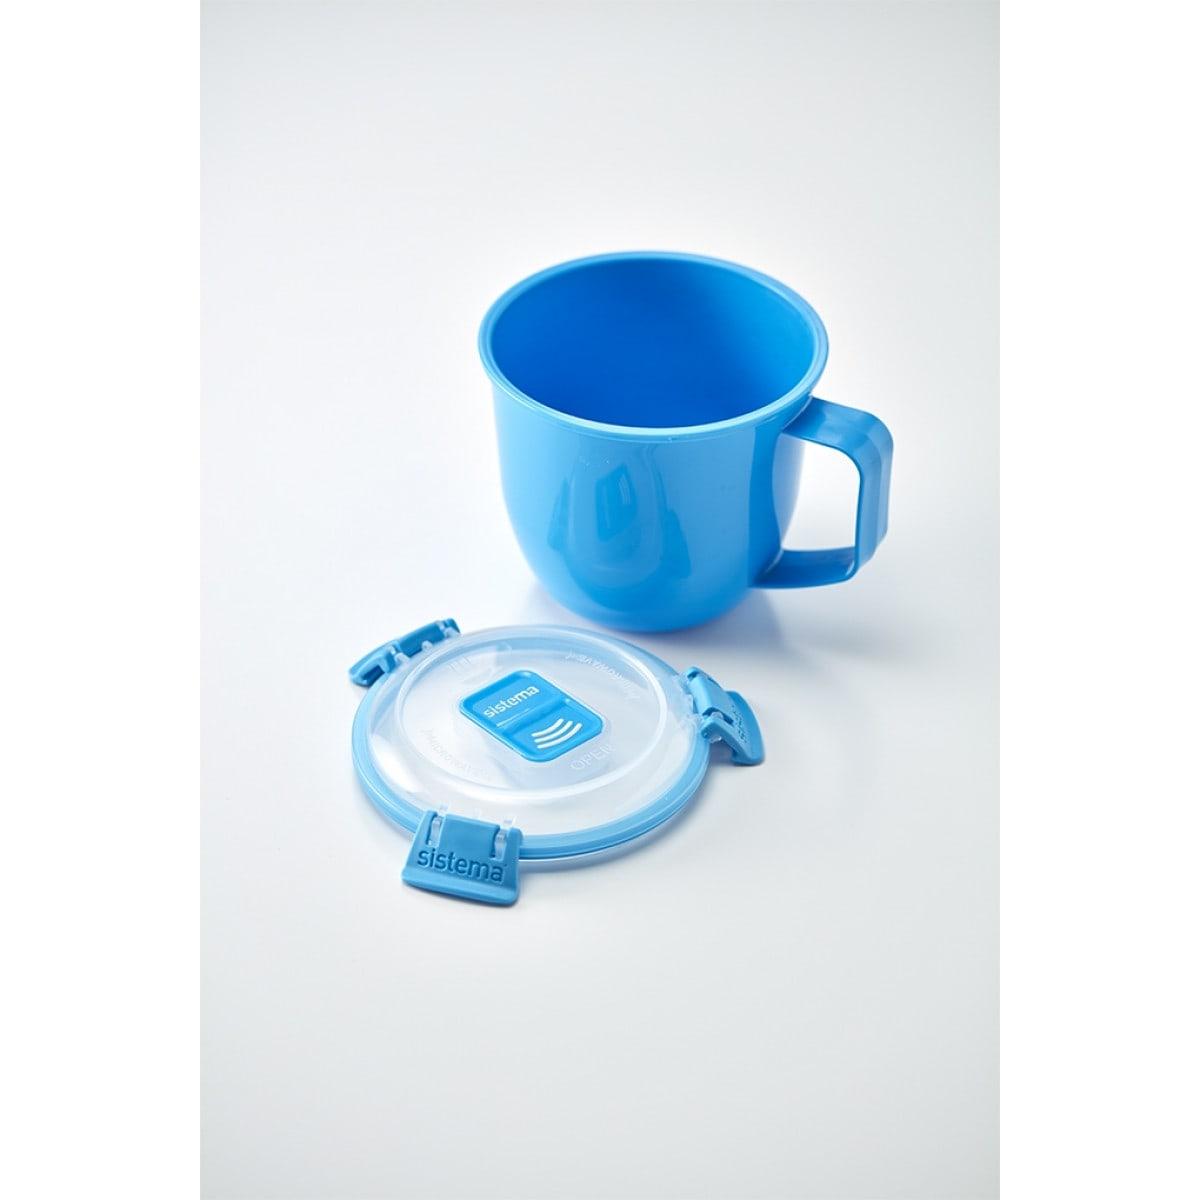 Sistema Soup Mug bleu, Couvercle sur le sol, 565 ml 2